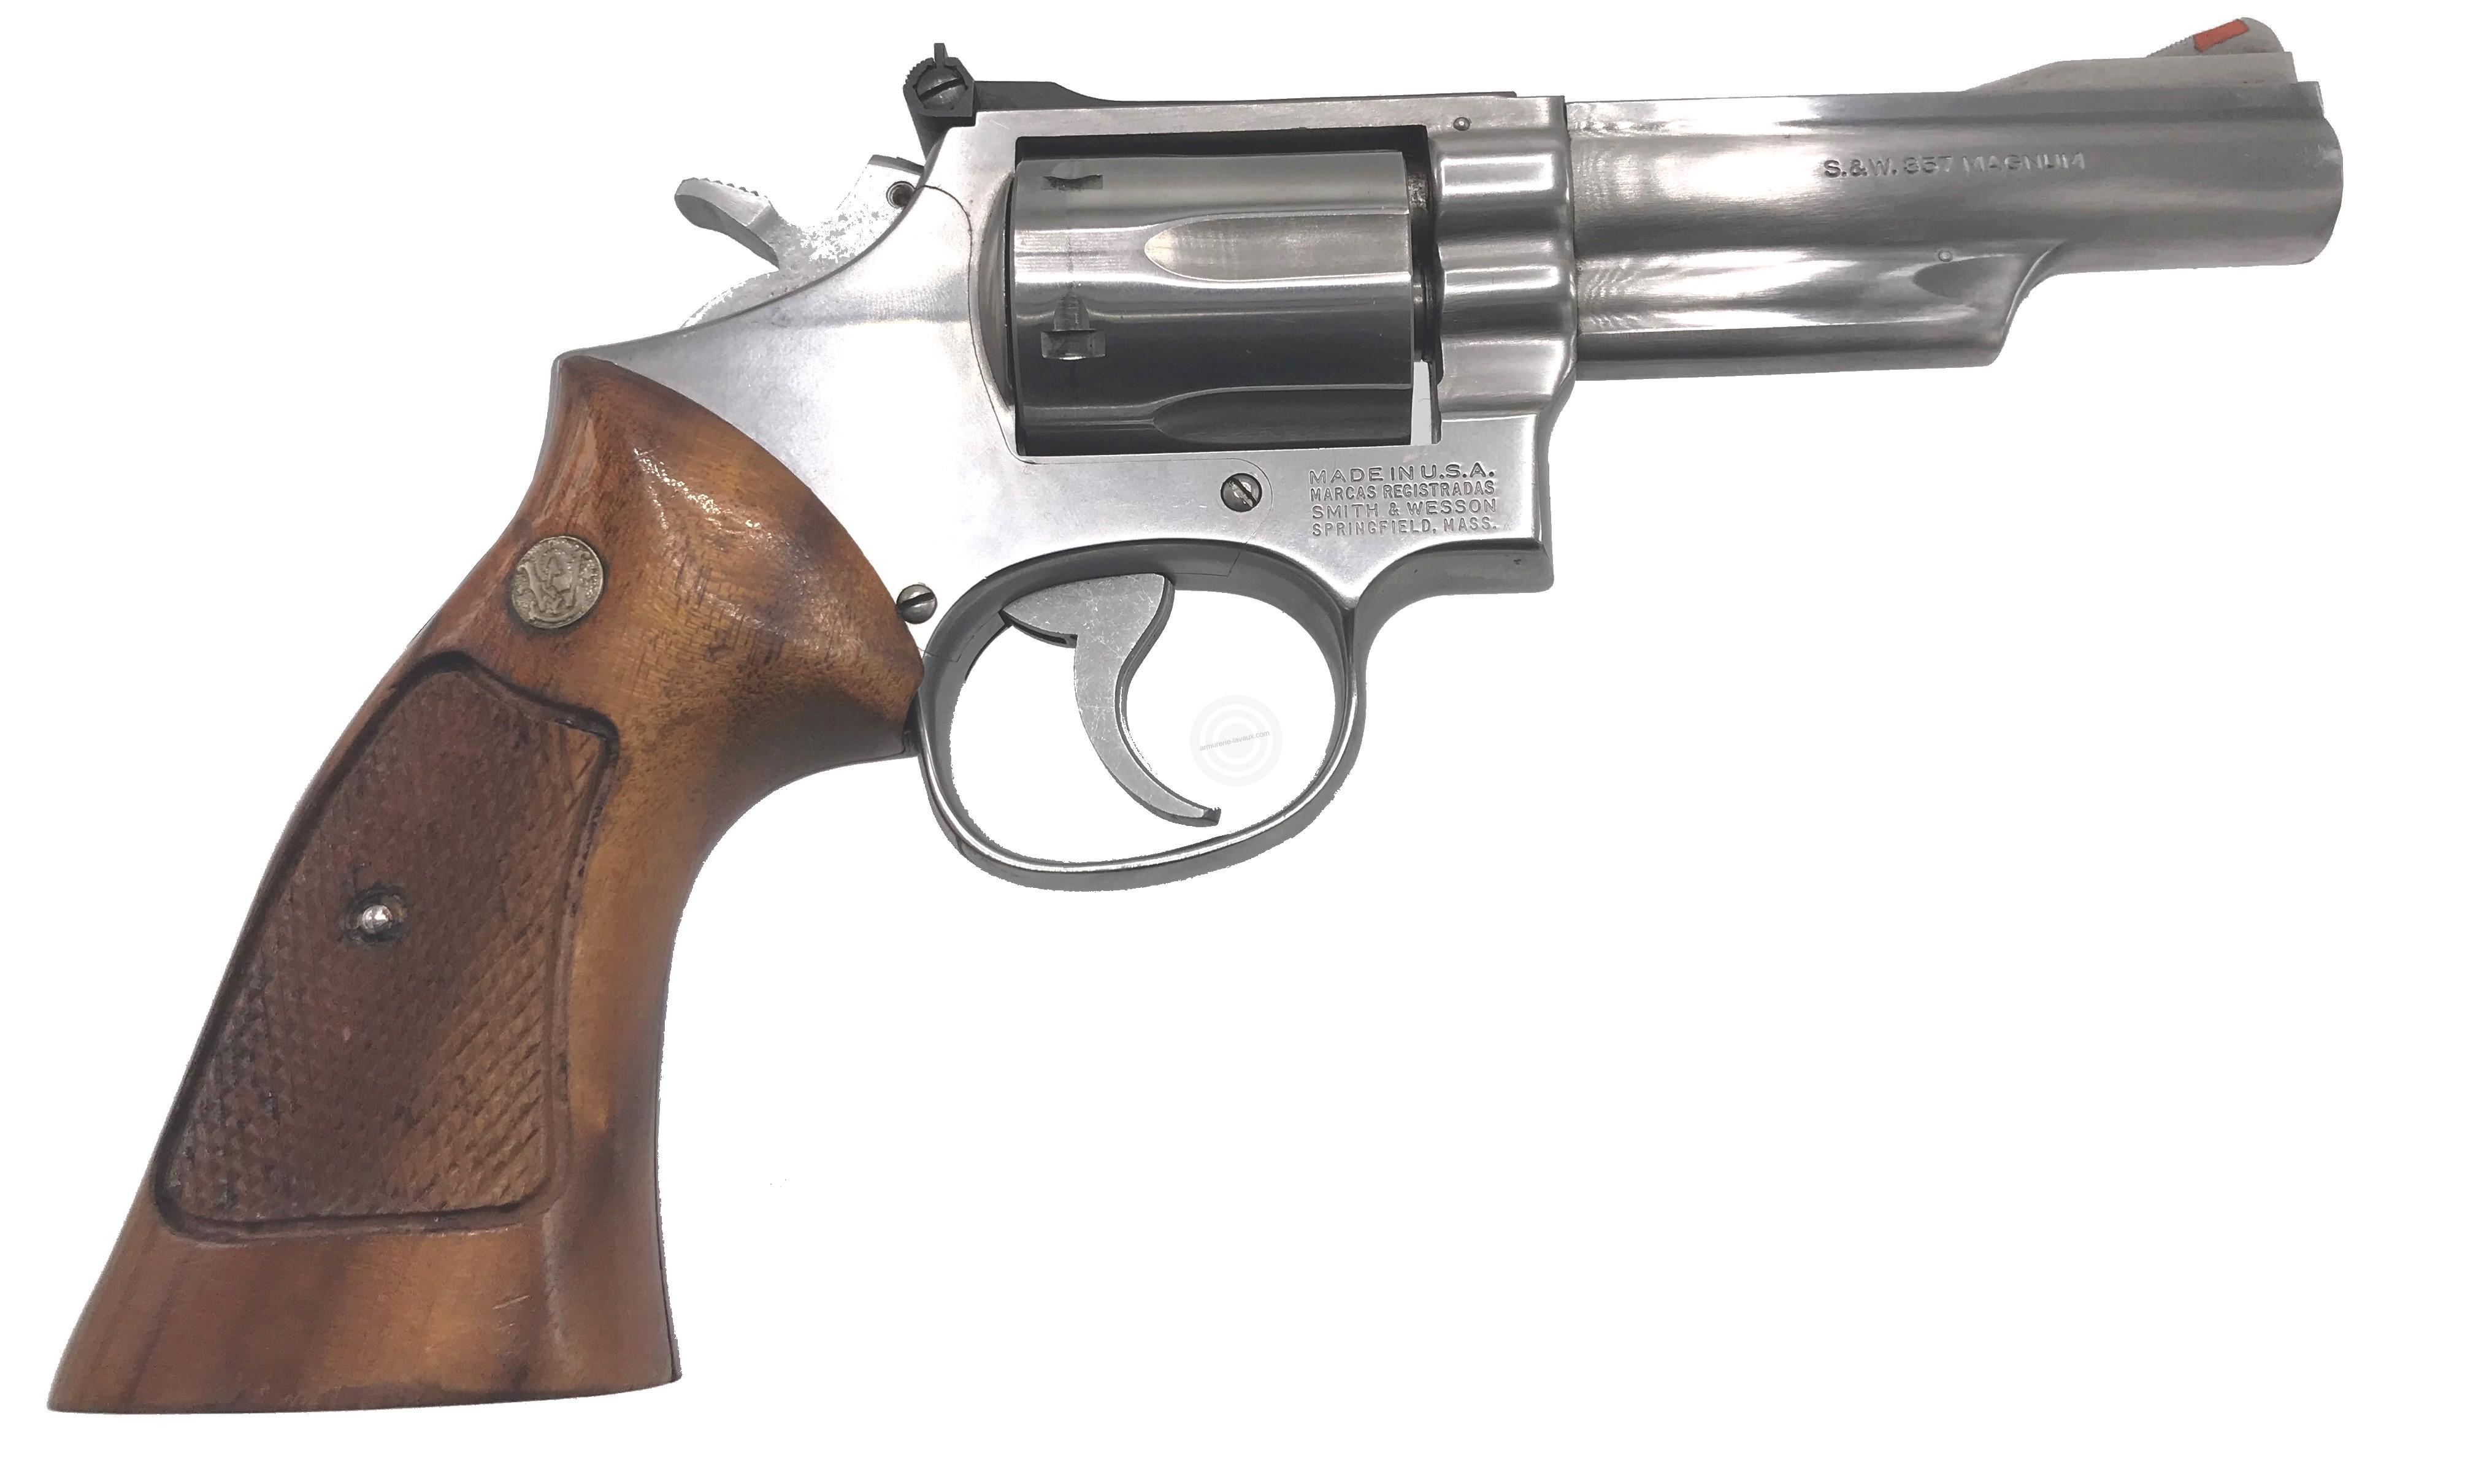 revolver smith wesson 4 magnum occasion armes cat gorie b sur armurerie lavaux. Black Bedroom Furniture Sets. Home Design Ideas